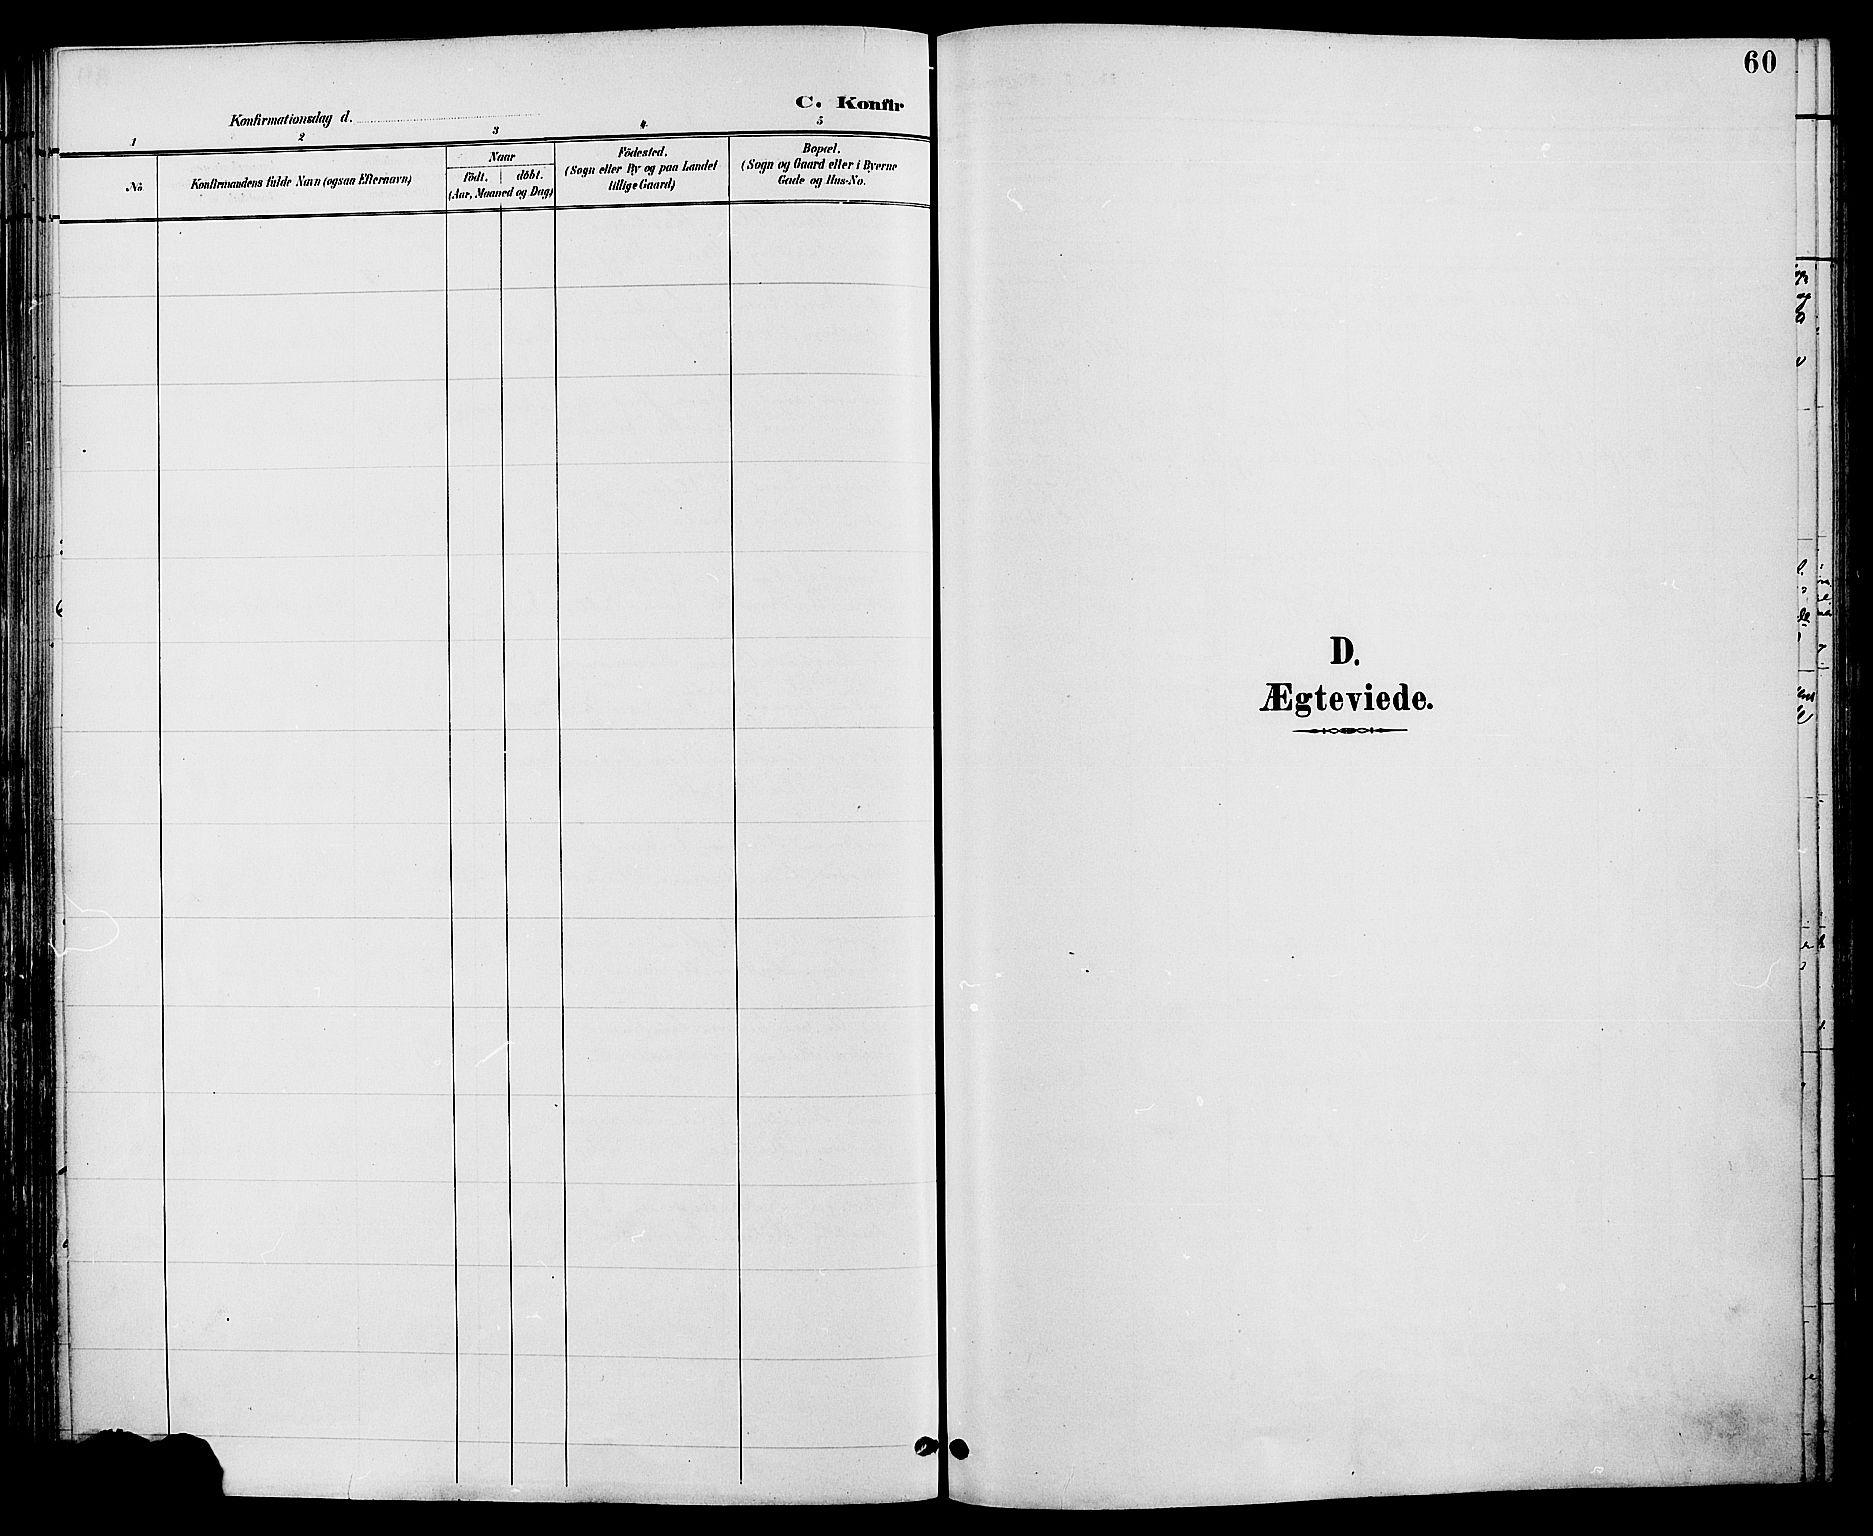 SAH, Biri prestekontor, Ministerialbok nr. 7, 1887-1893, s. 60